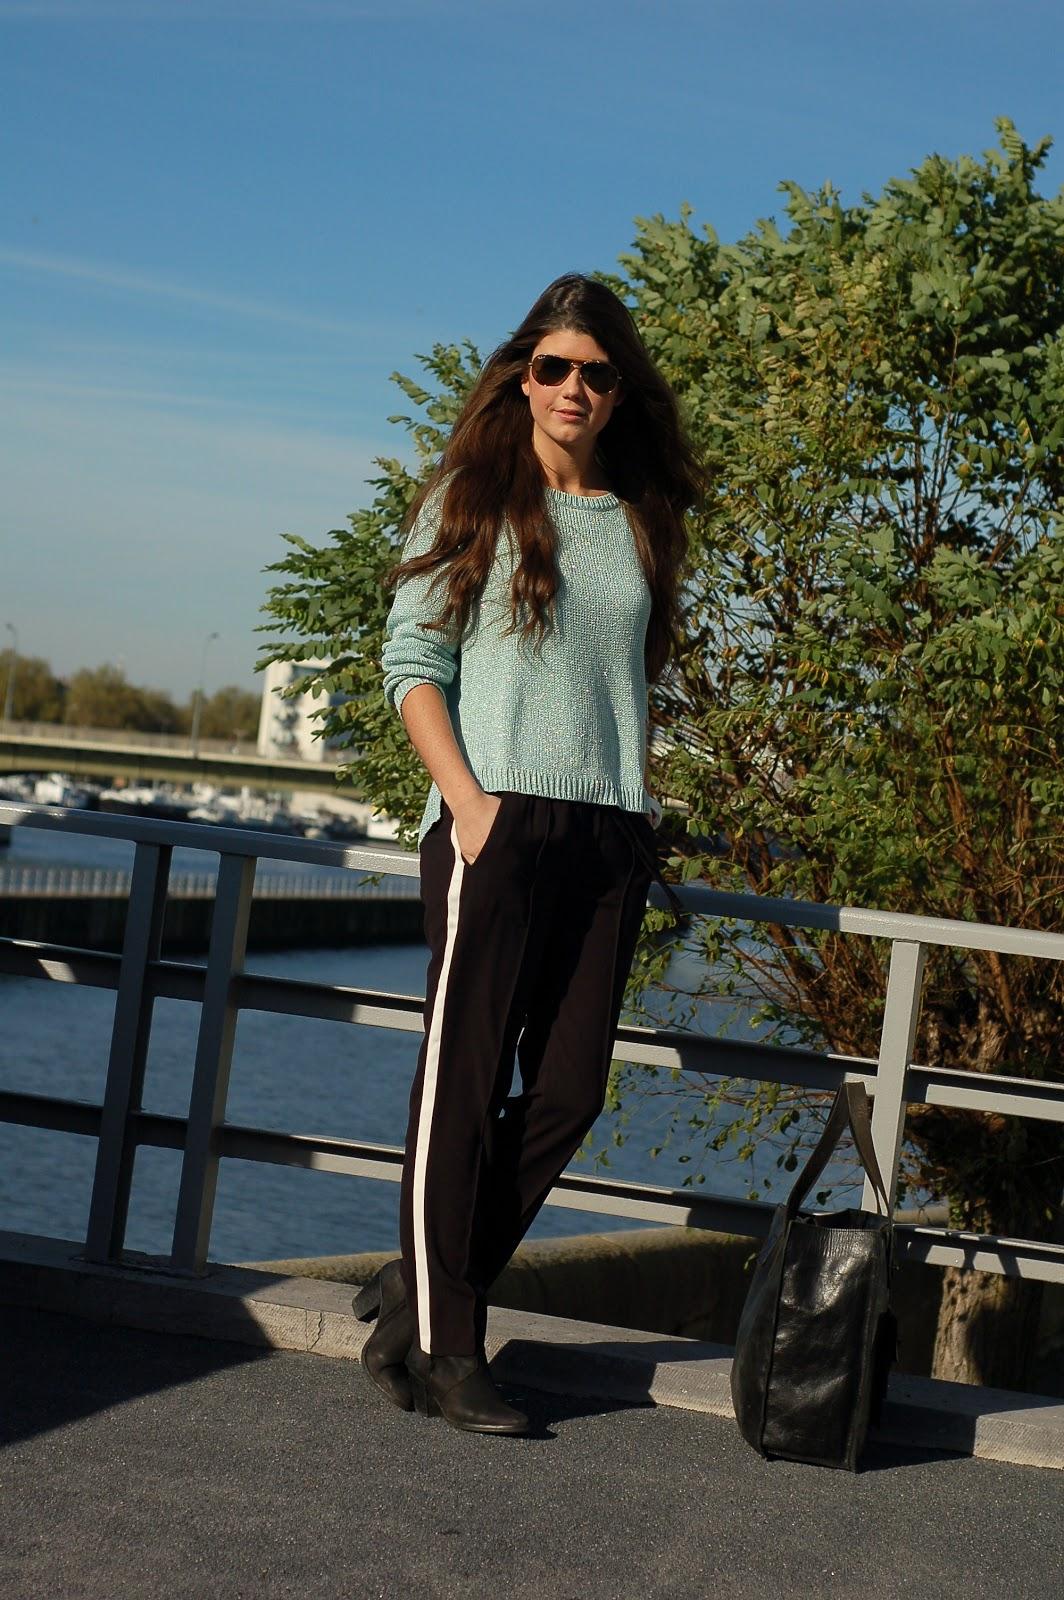 fashionista chloe fashionblogger 2012